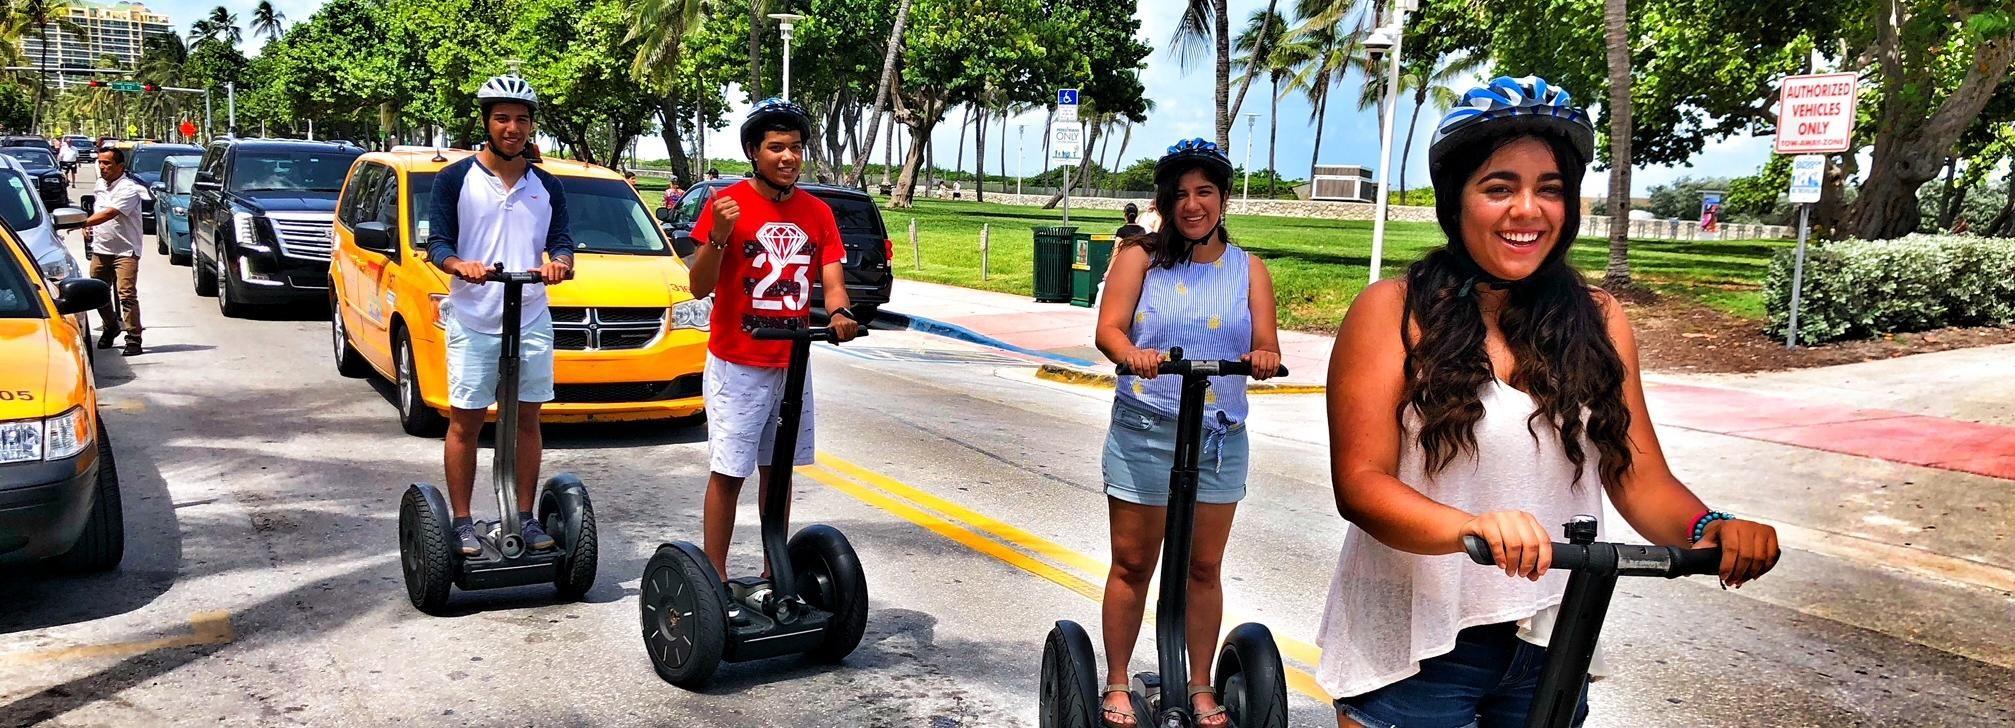 Miami: tour in Segway di Ocean Drive